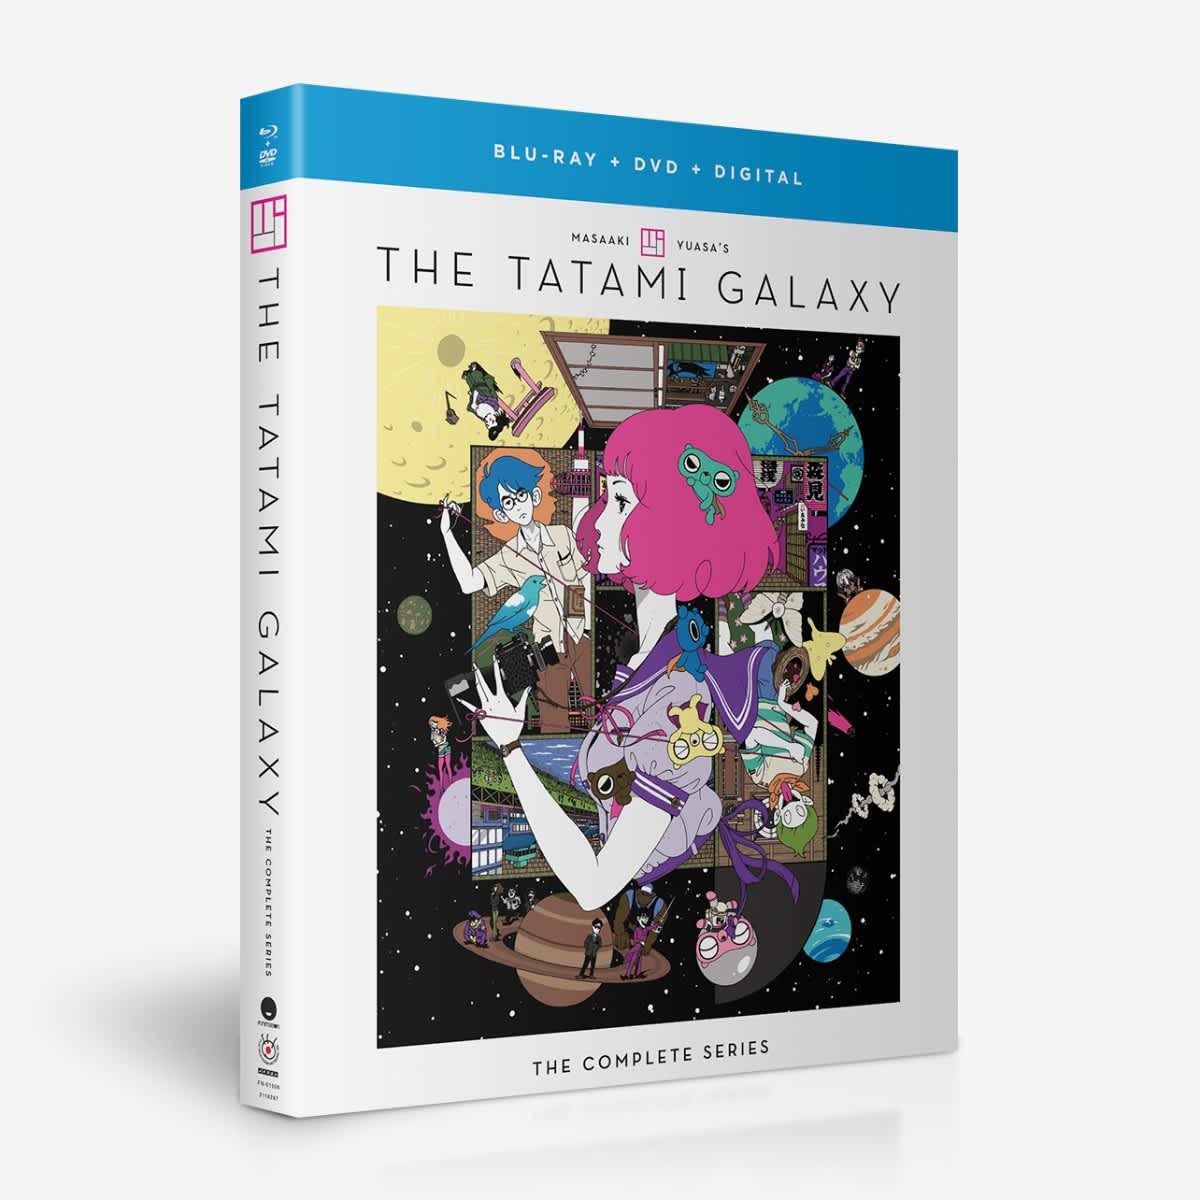 The Tatami Galaxy Blu-ray/DVD